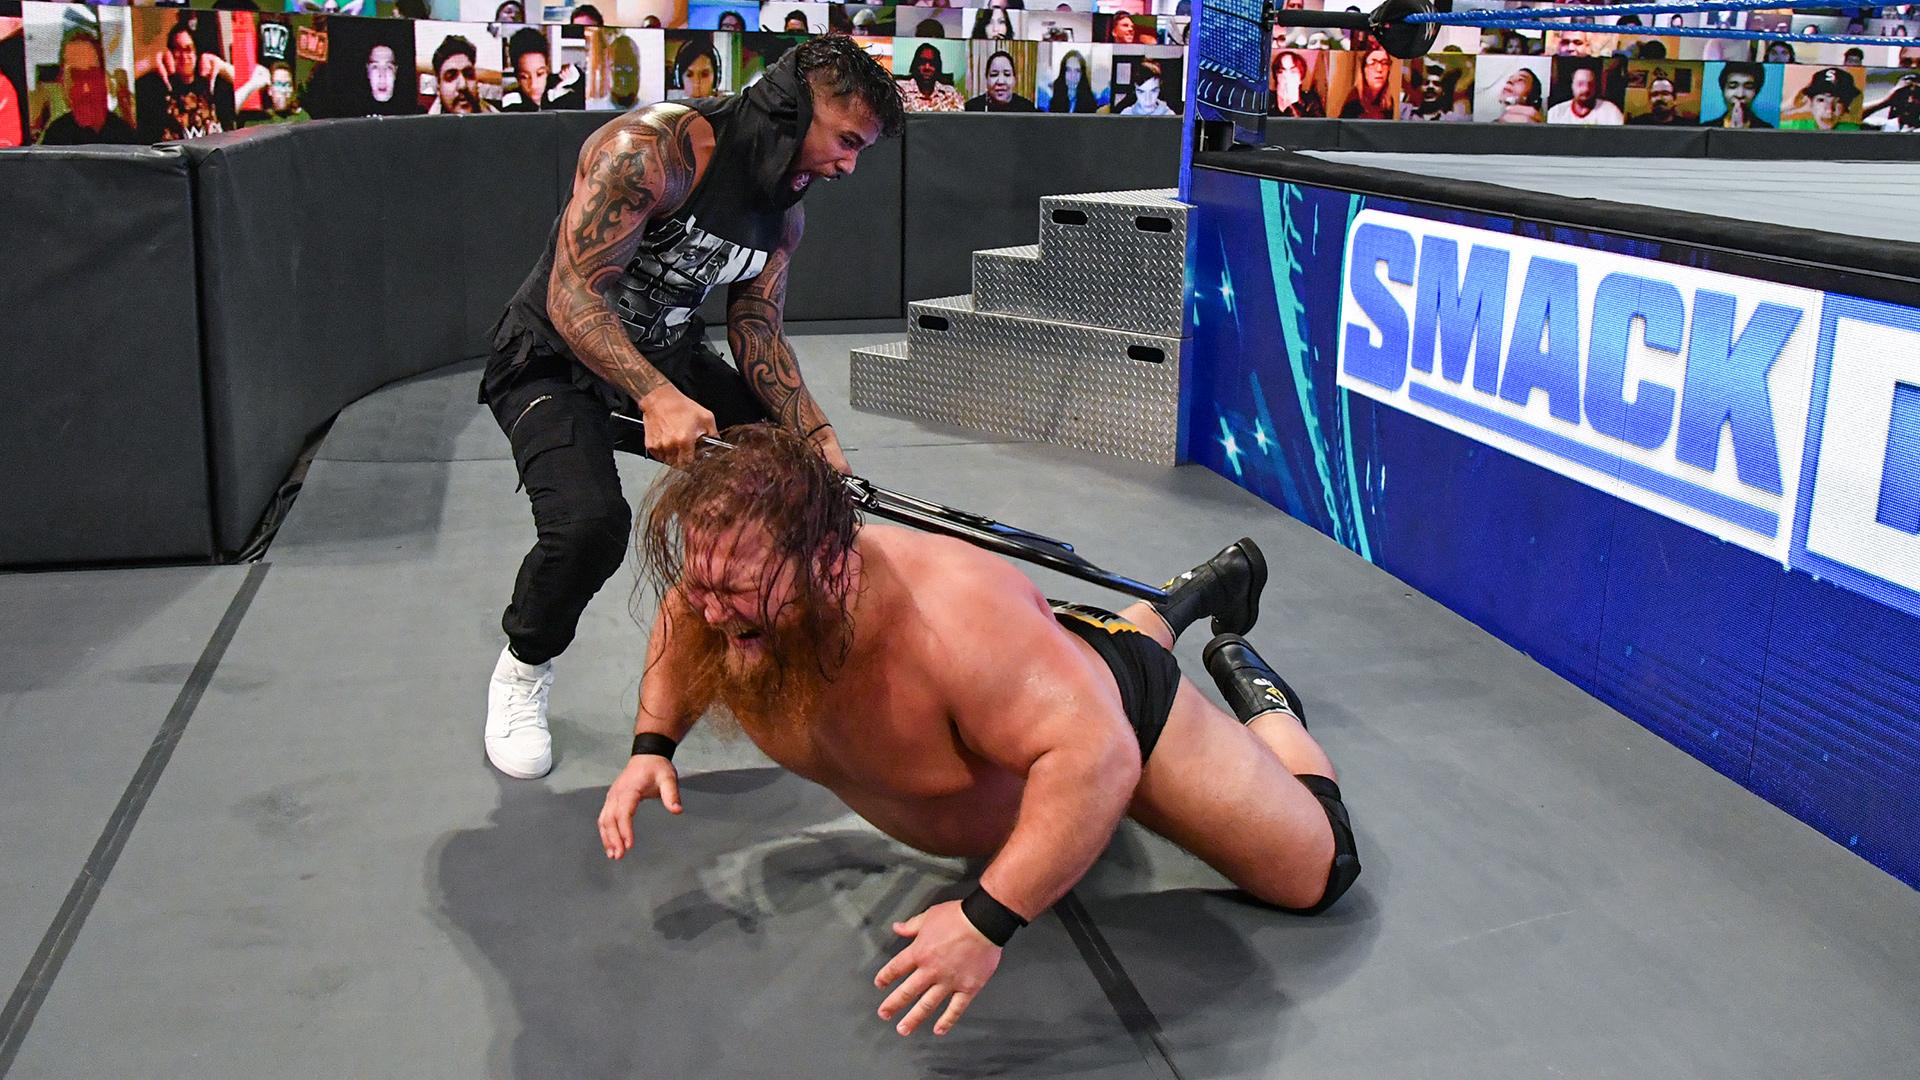 WWE confirma que Otis sofreu múltiplas lesões após ataque brutal de Jey Uso